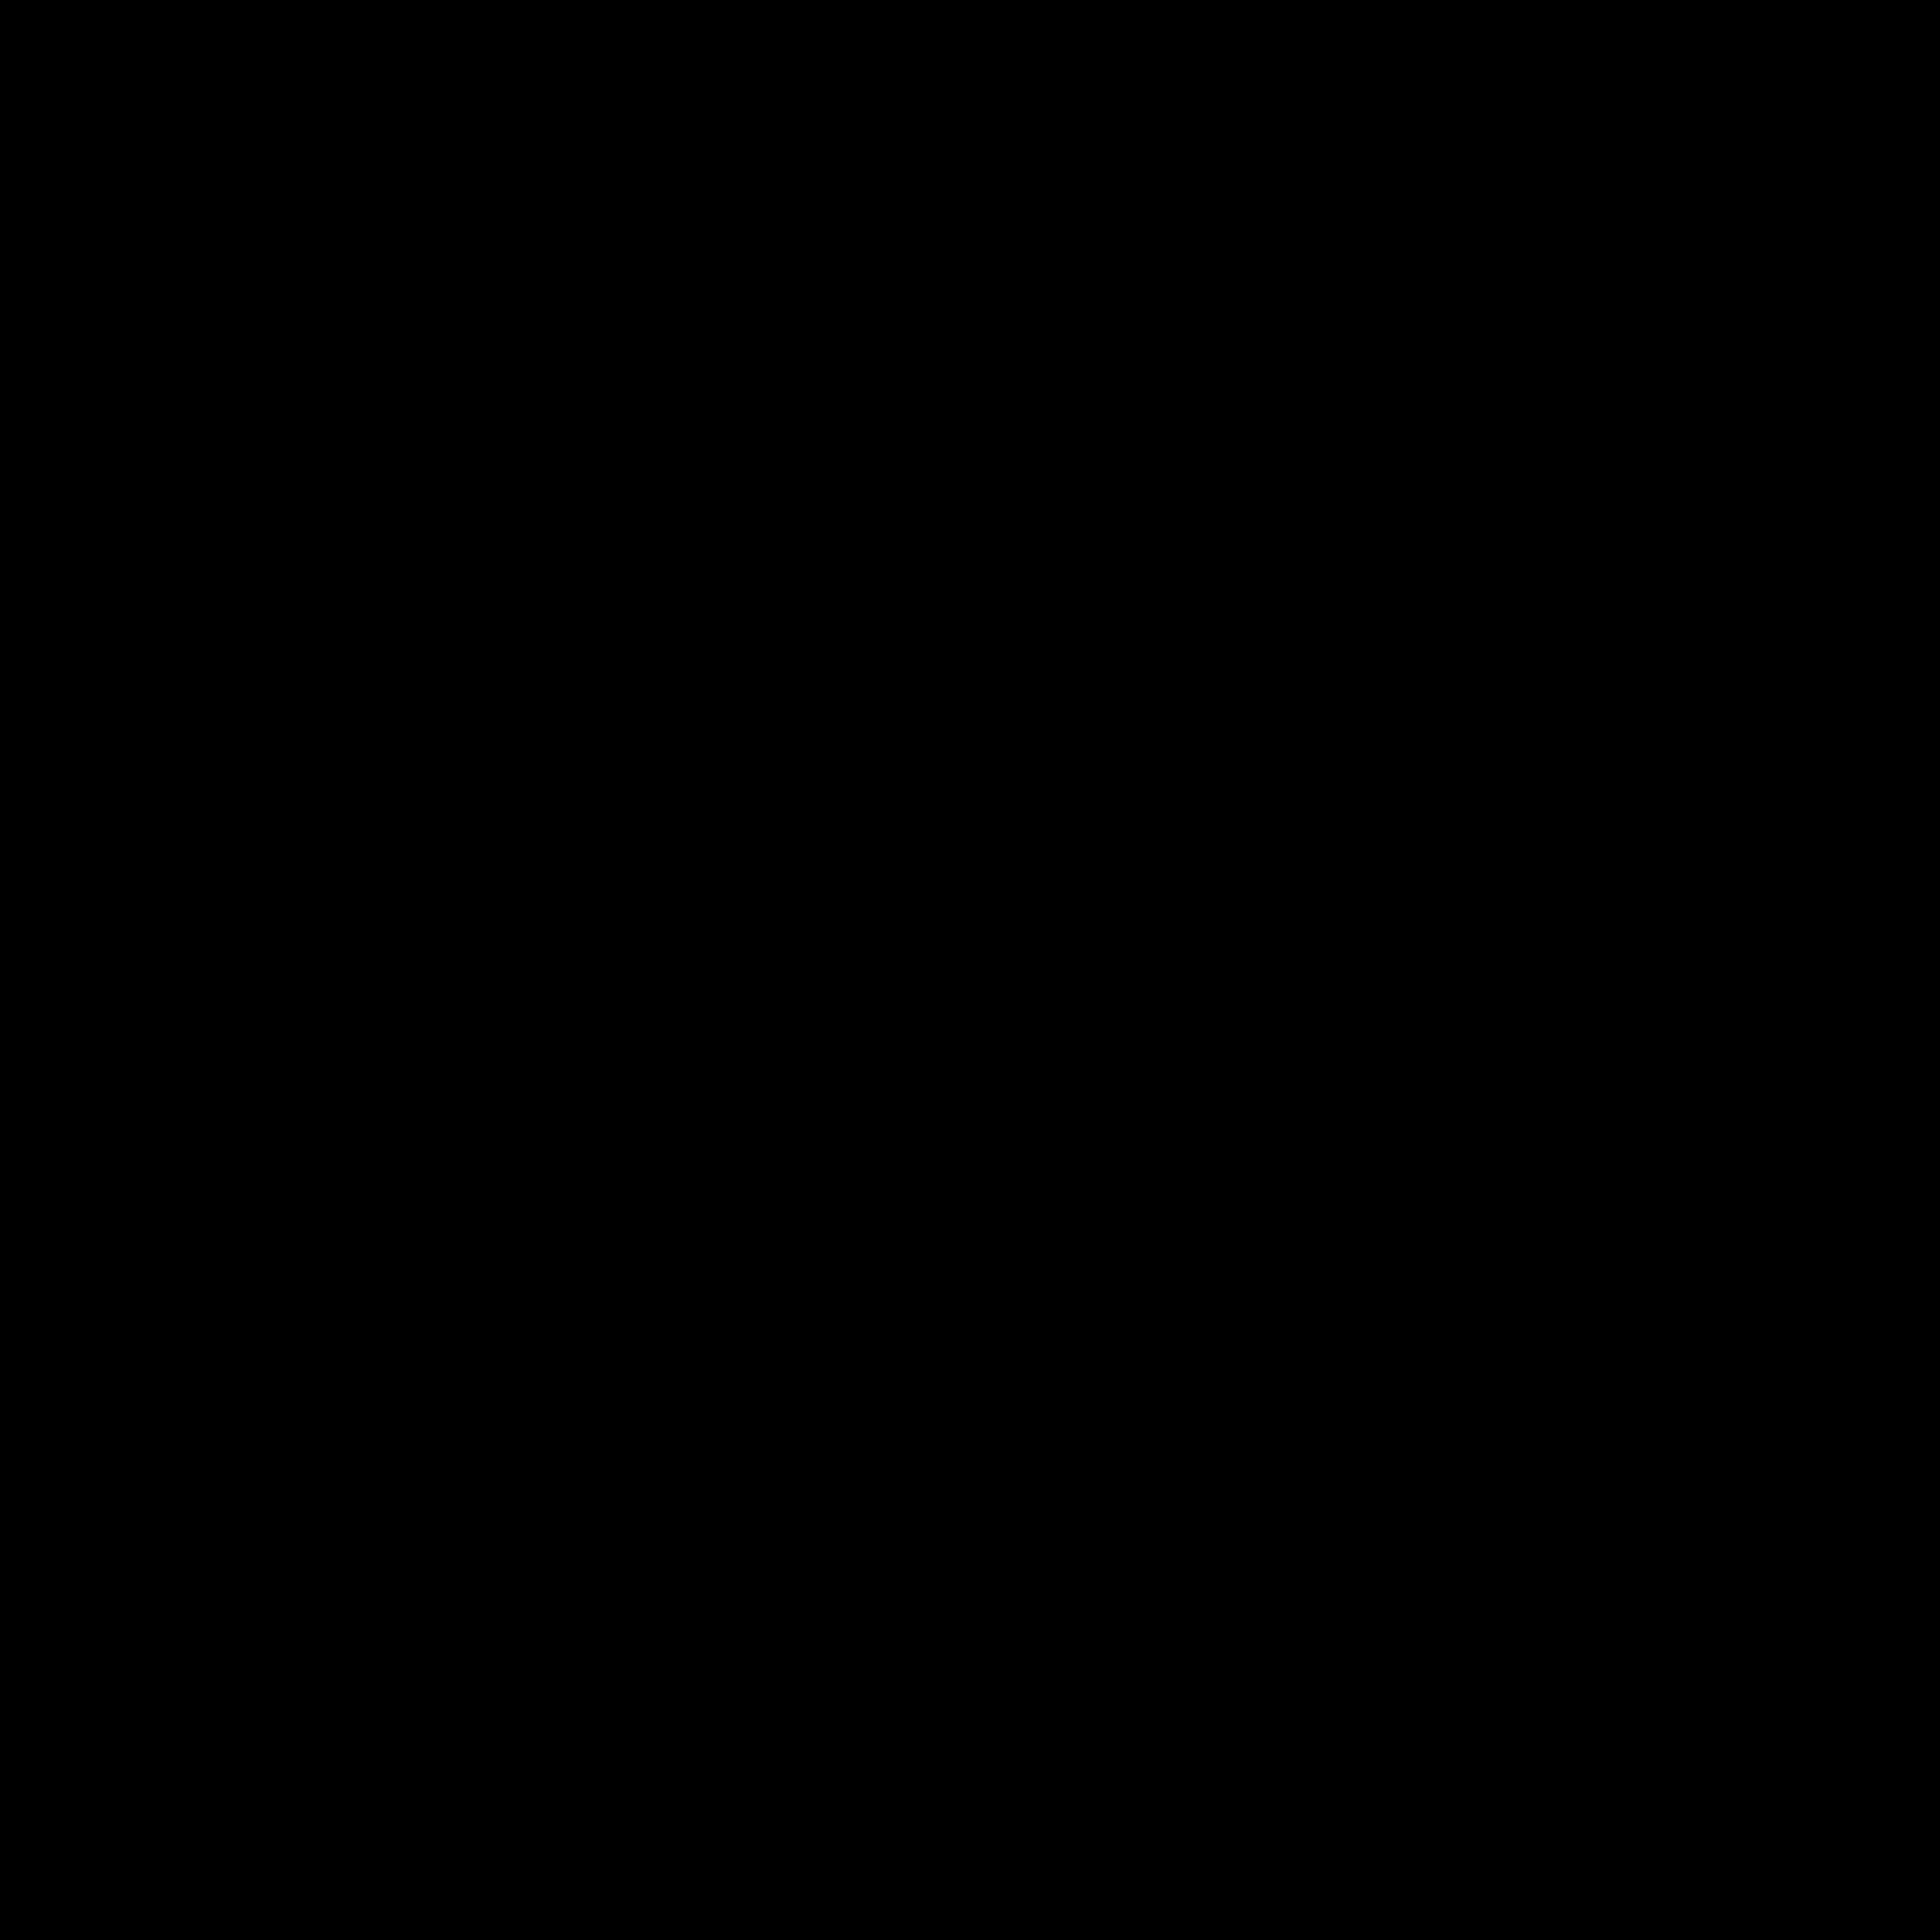 MLS Logo PNG Transparent & SVG Vector - Freebie Supply